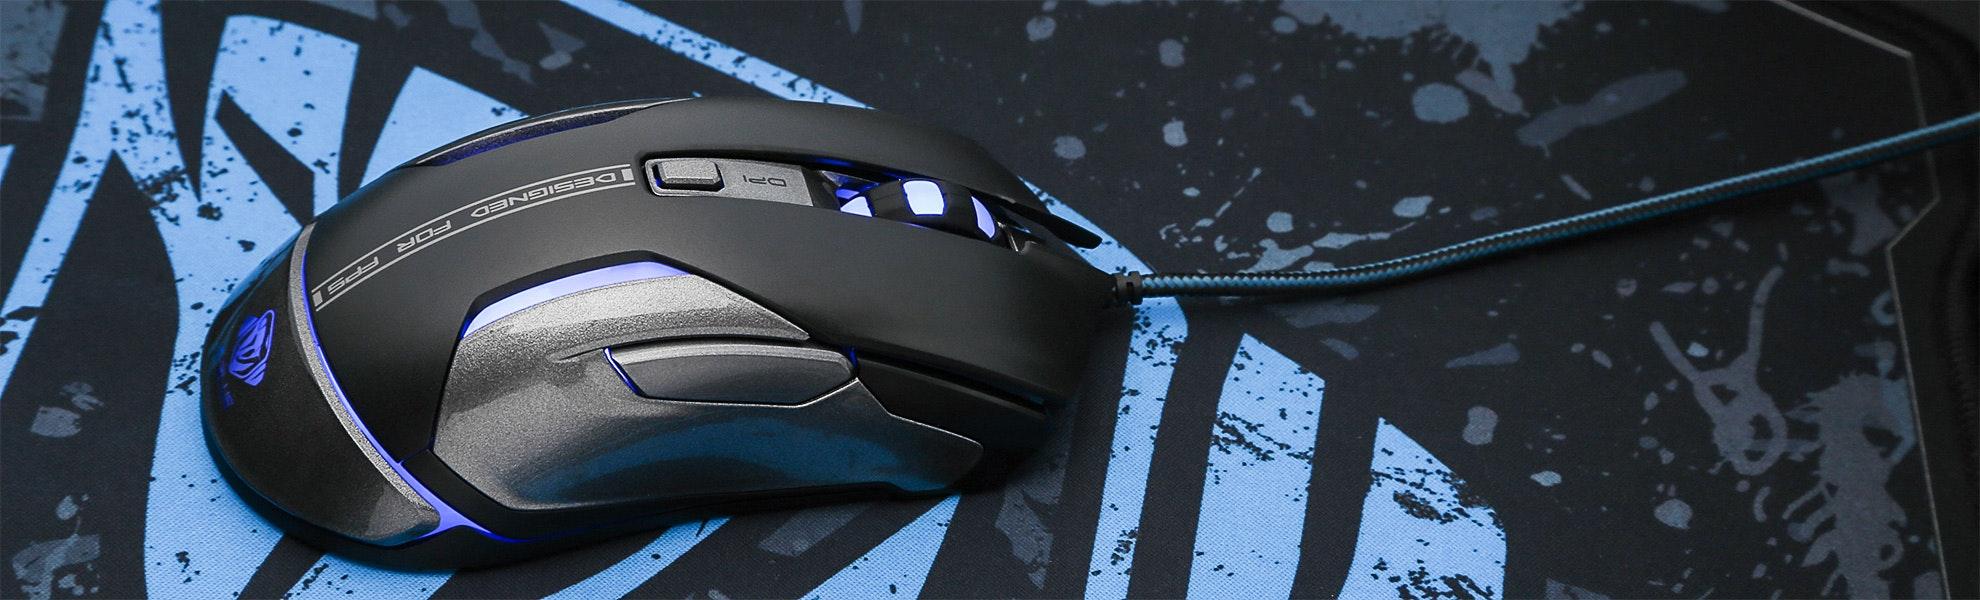 E-Blue Auroza Laser Gaming Mouse